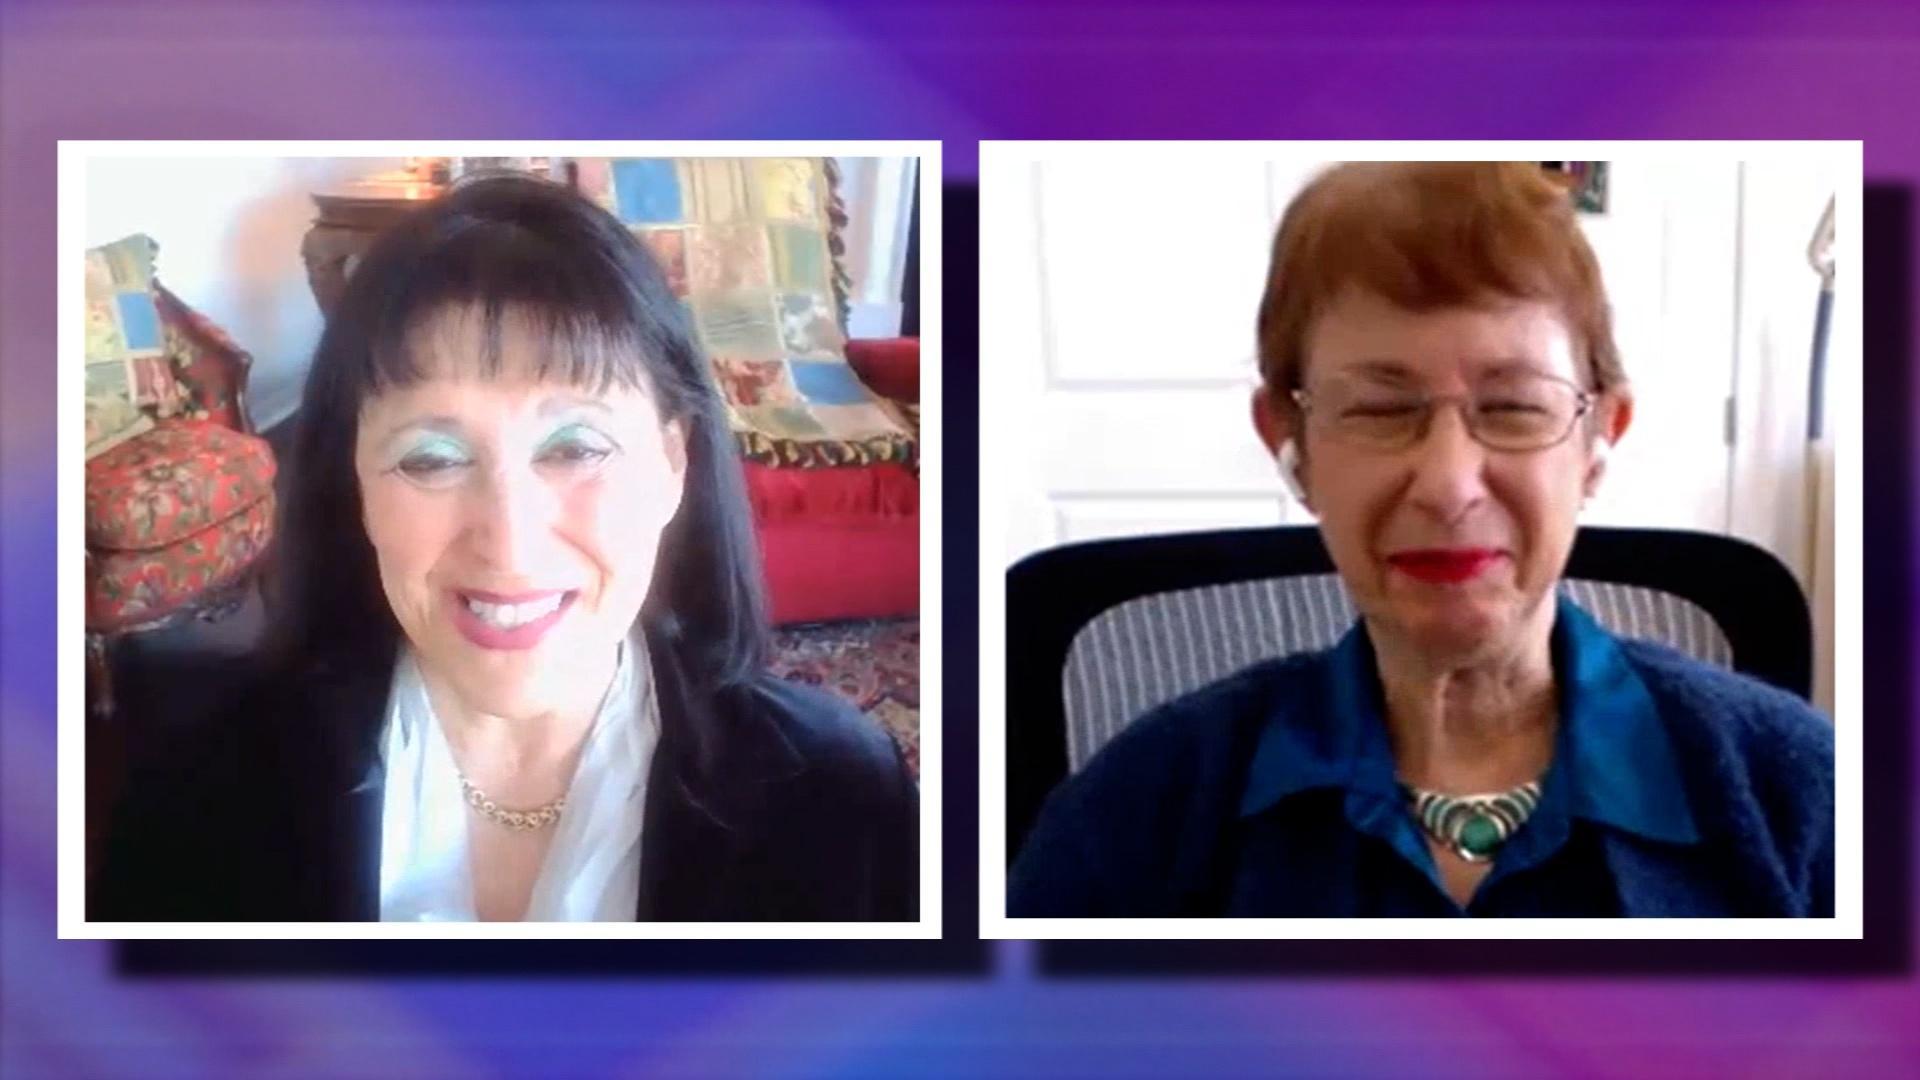 Woman Thought Leader: Joann Lublin